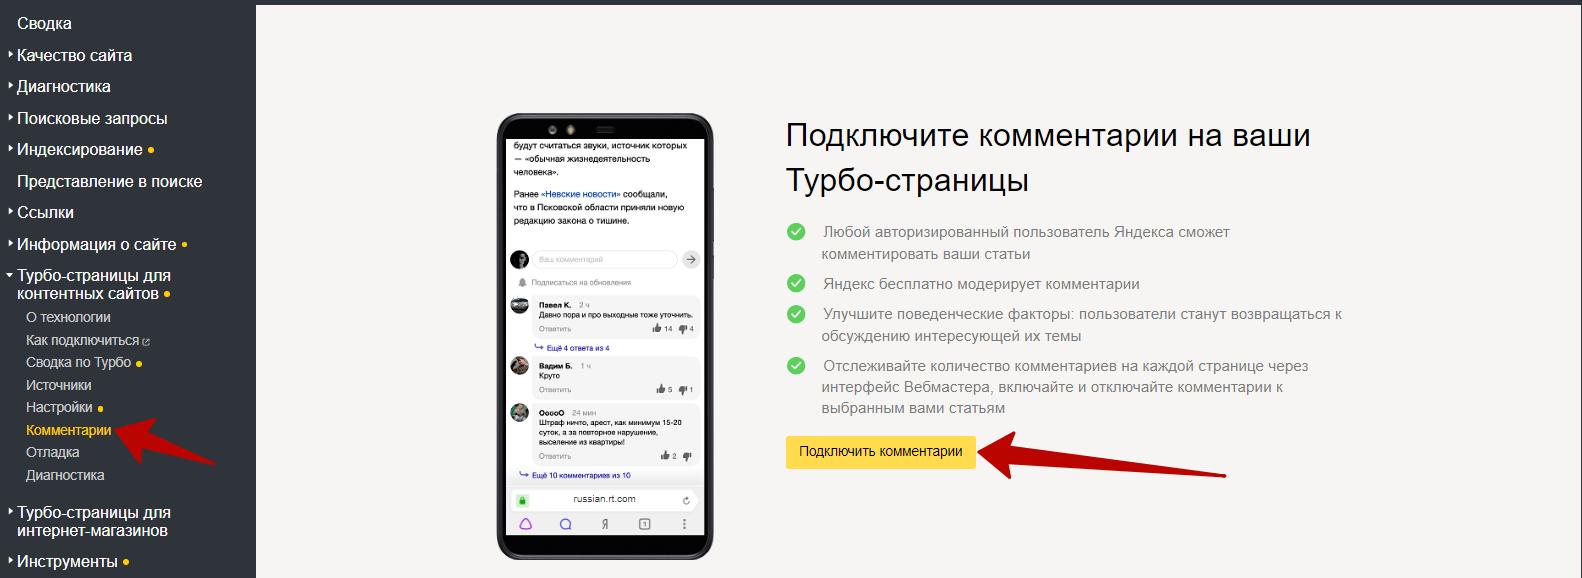 Яндекс Вебмастер – комментарии для турбо-страниц